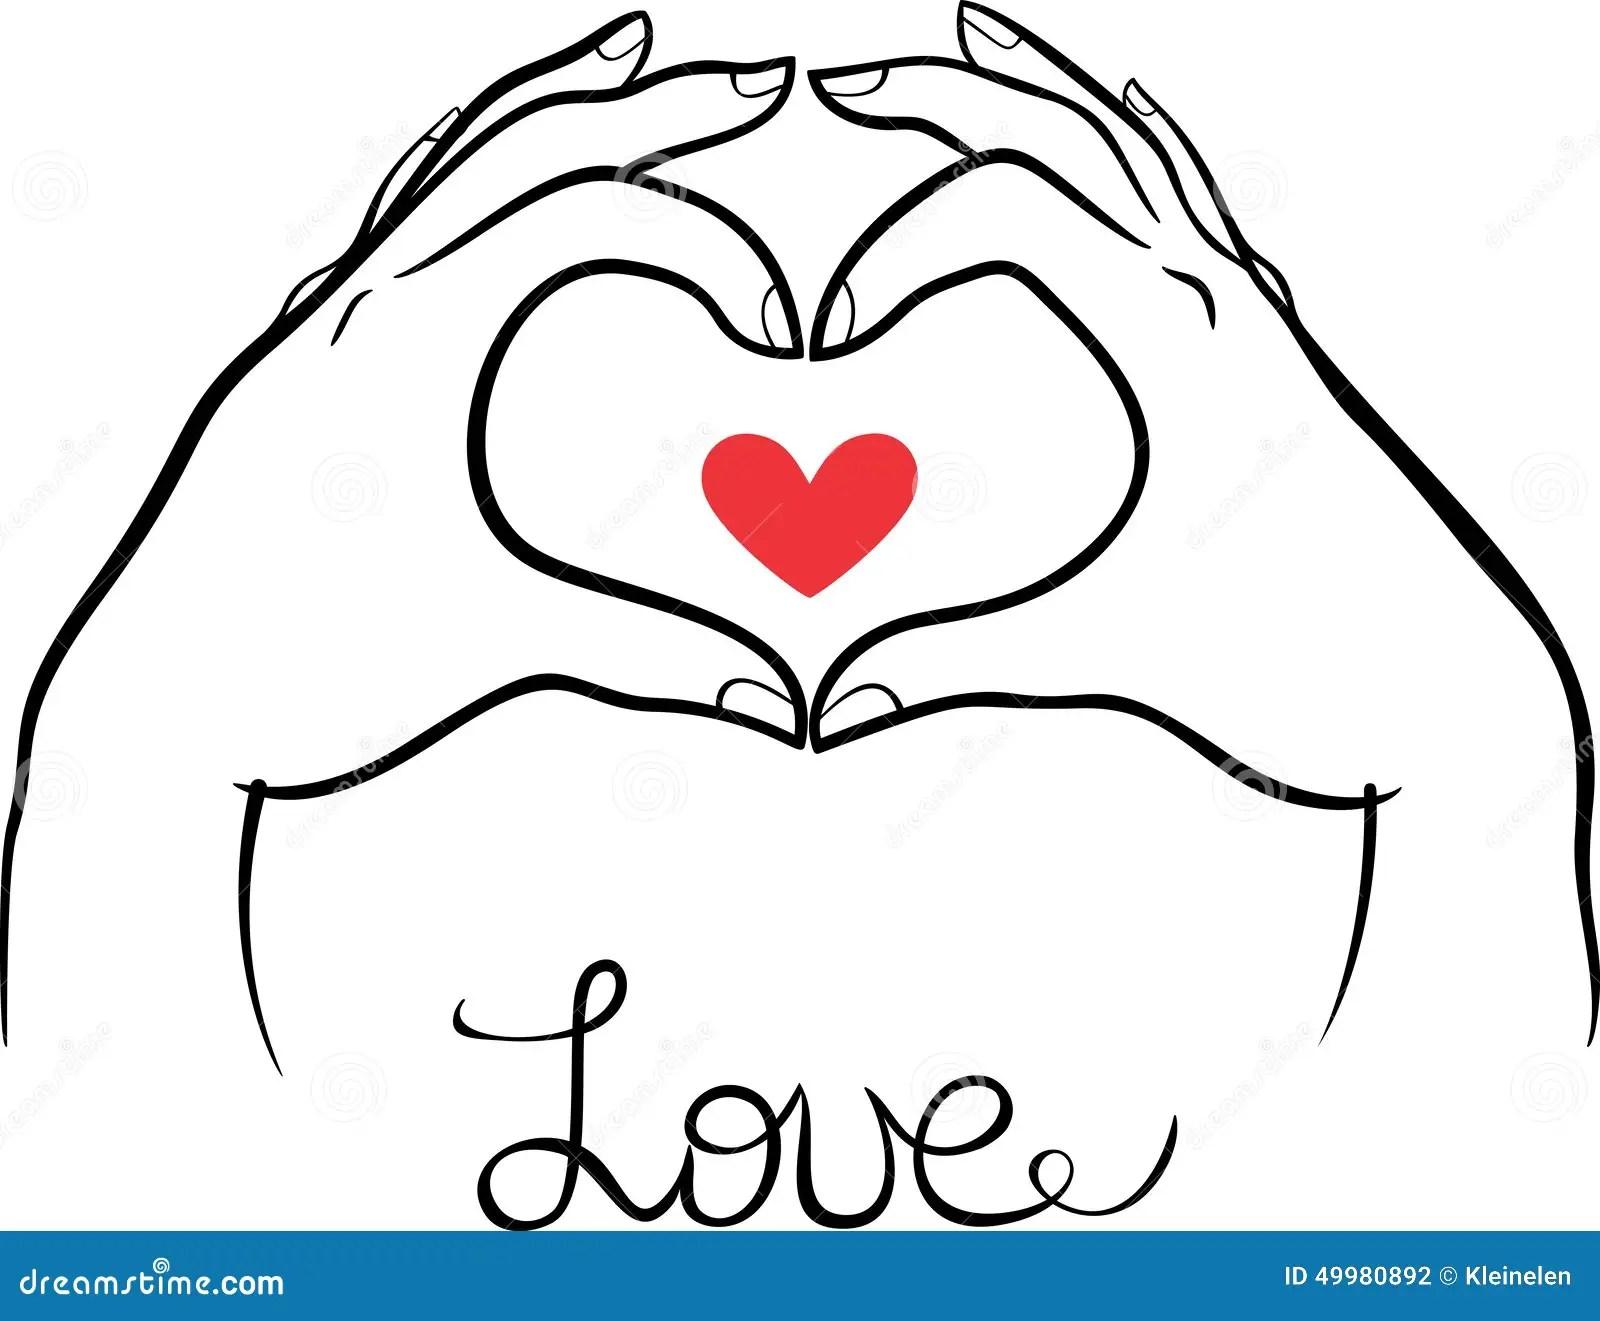 Hands Making A Heart Gesture Stock Vector